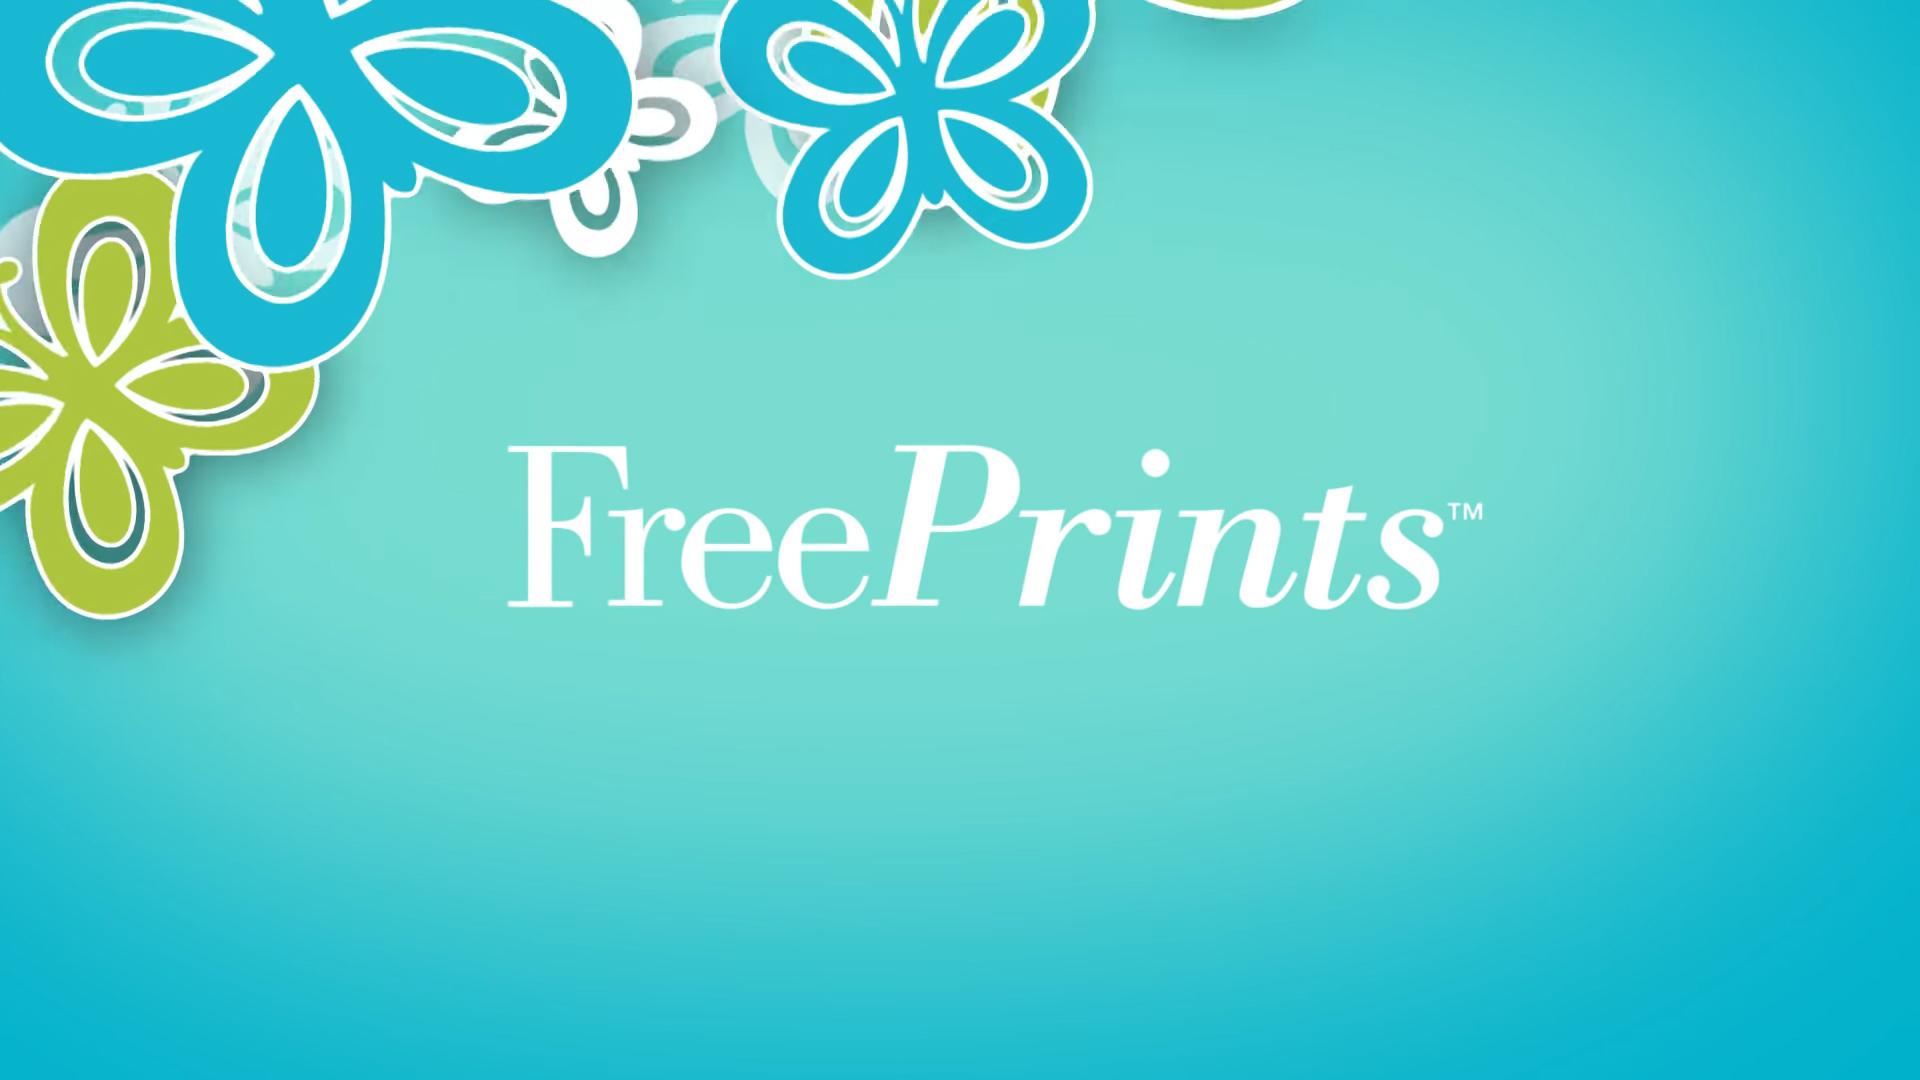 Free Prints Promo Codes